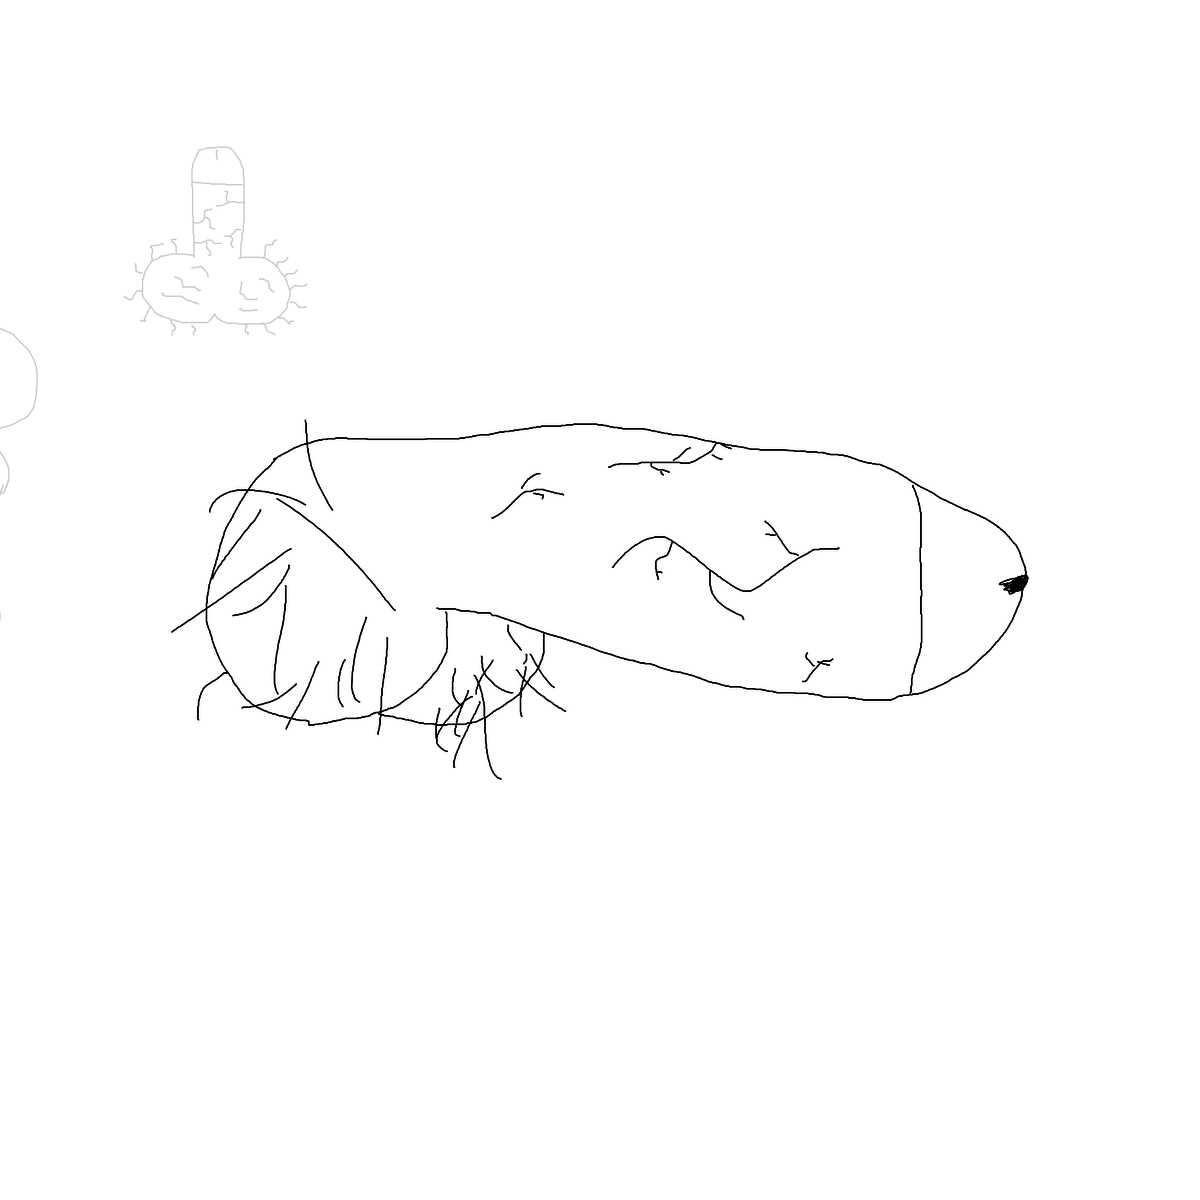 BAAAM drawing#16139 lat:24.1642799377441400lng: -110.2959518432617200